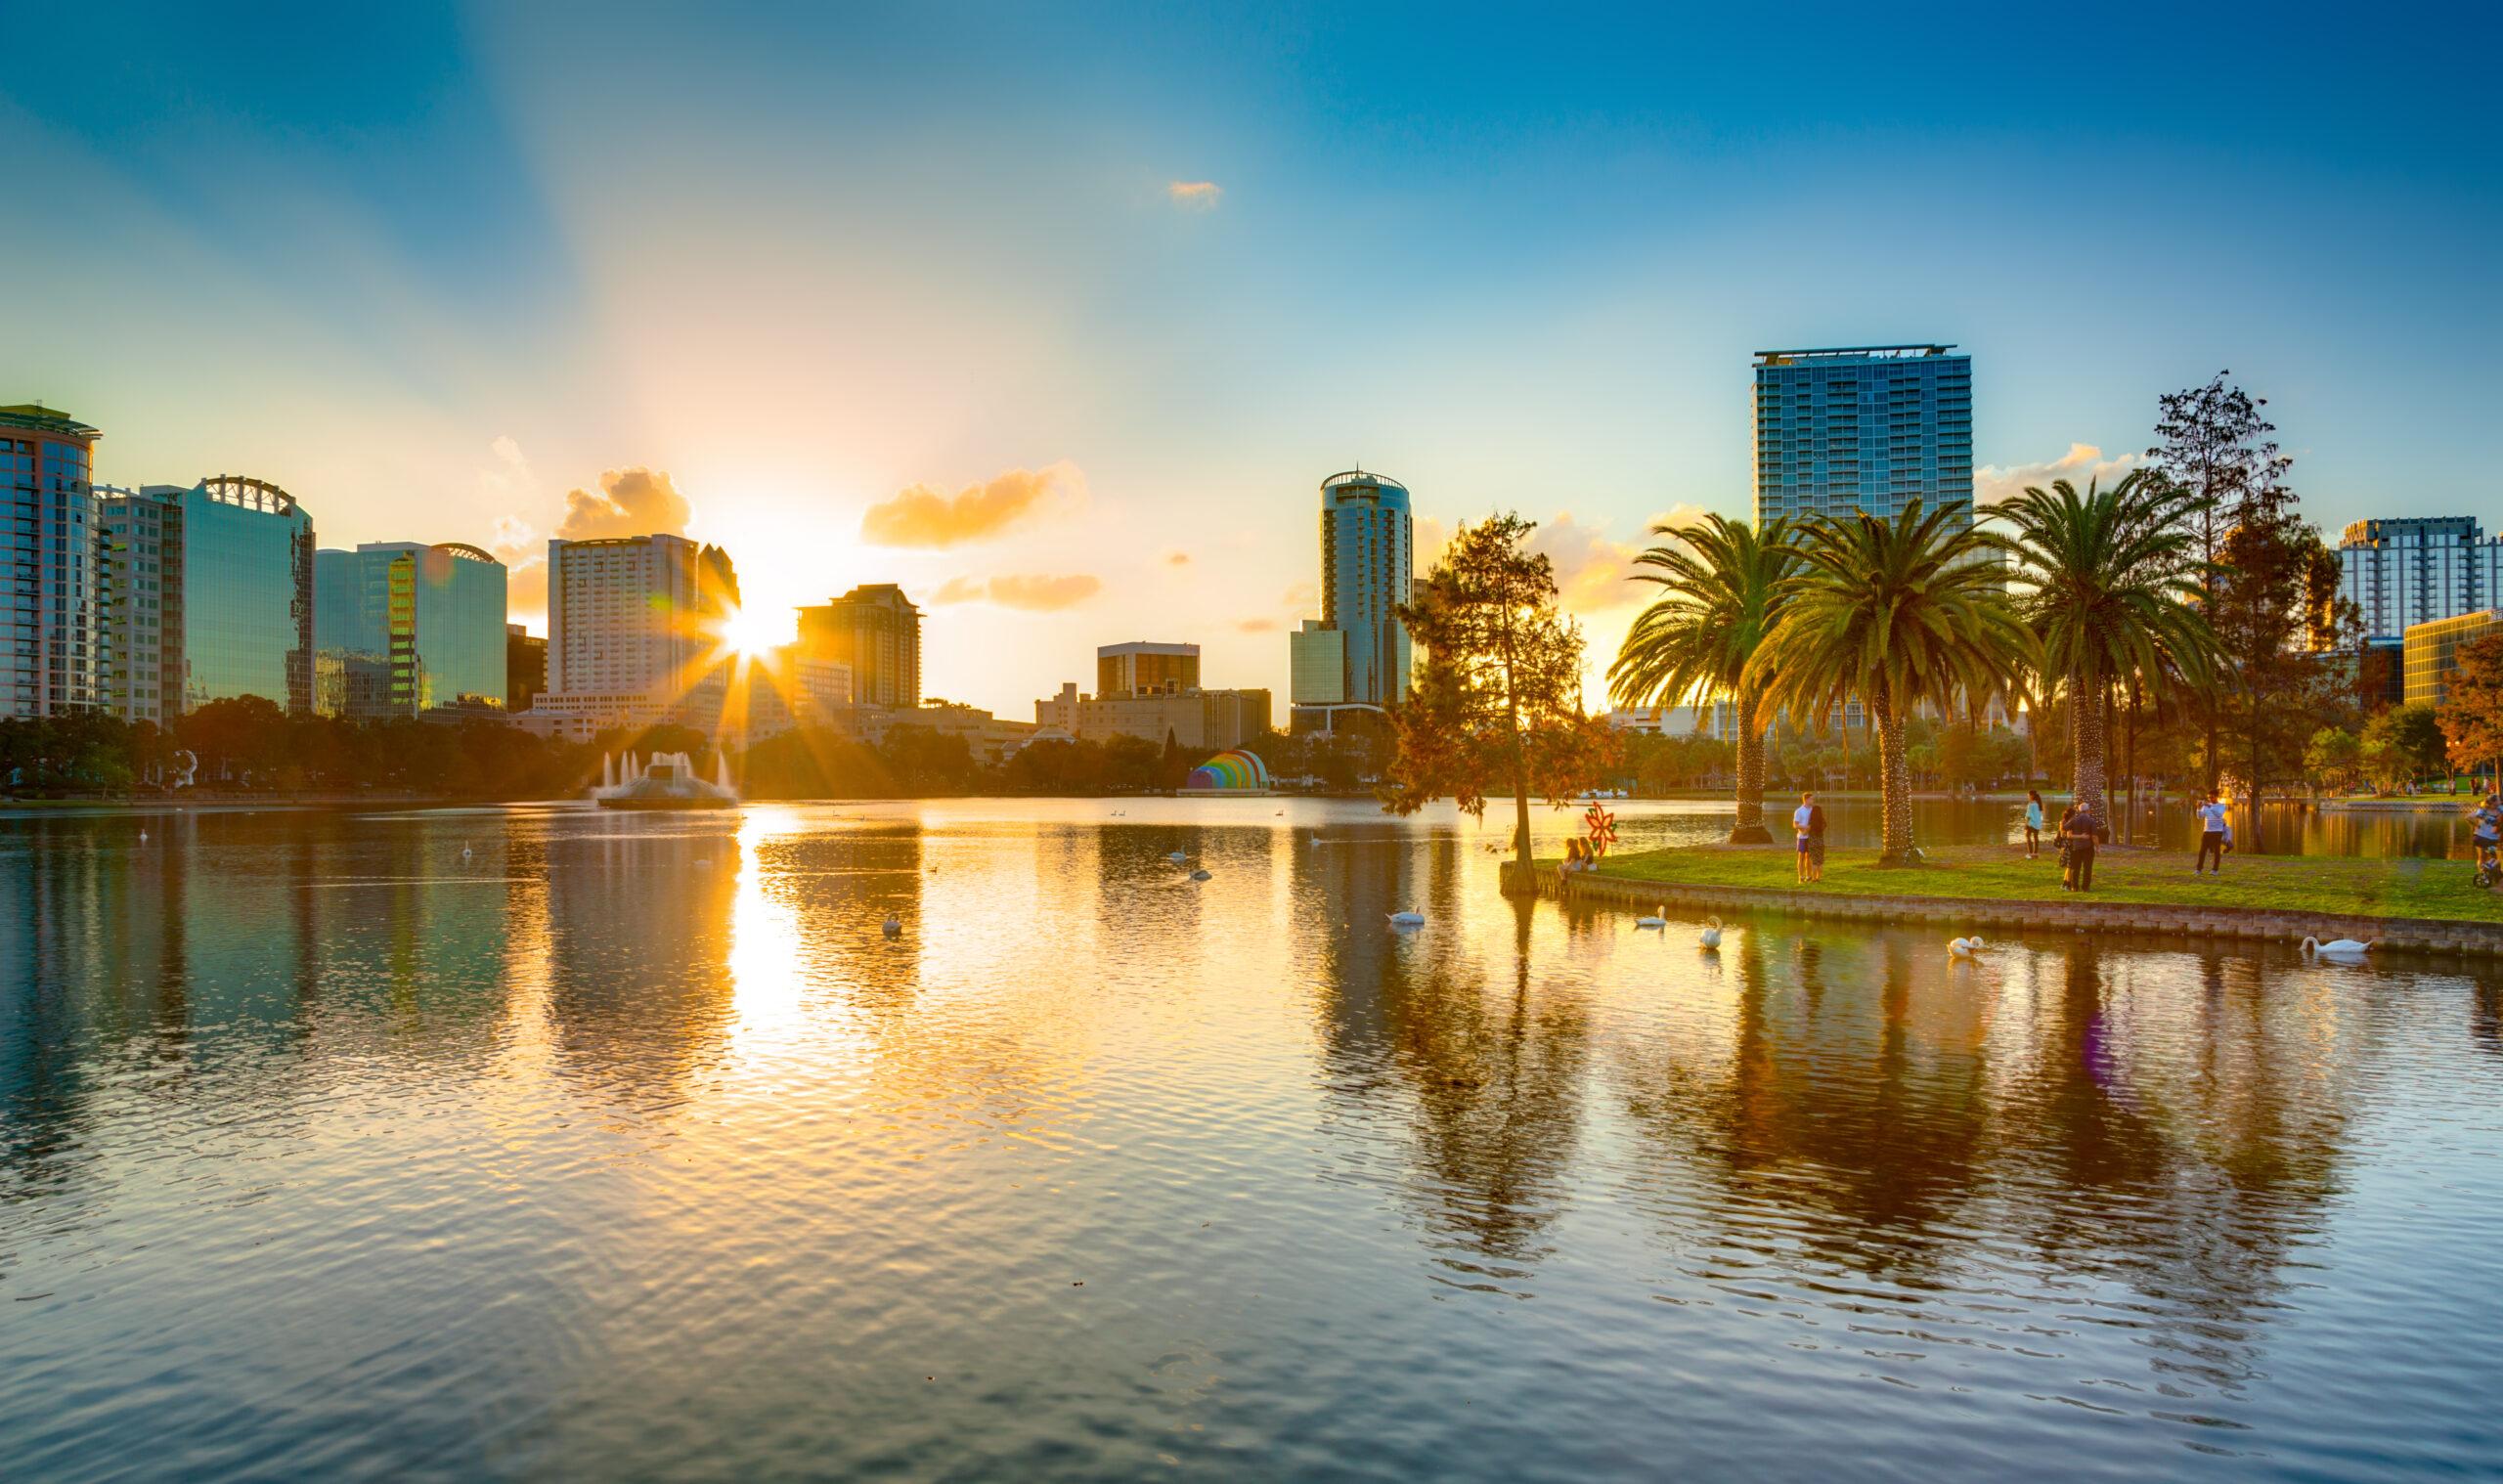 Orlando outdoor activities scaled